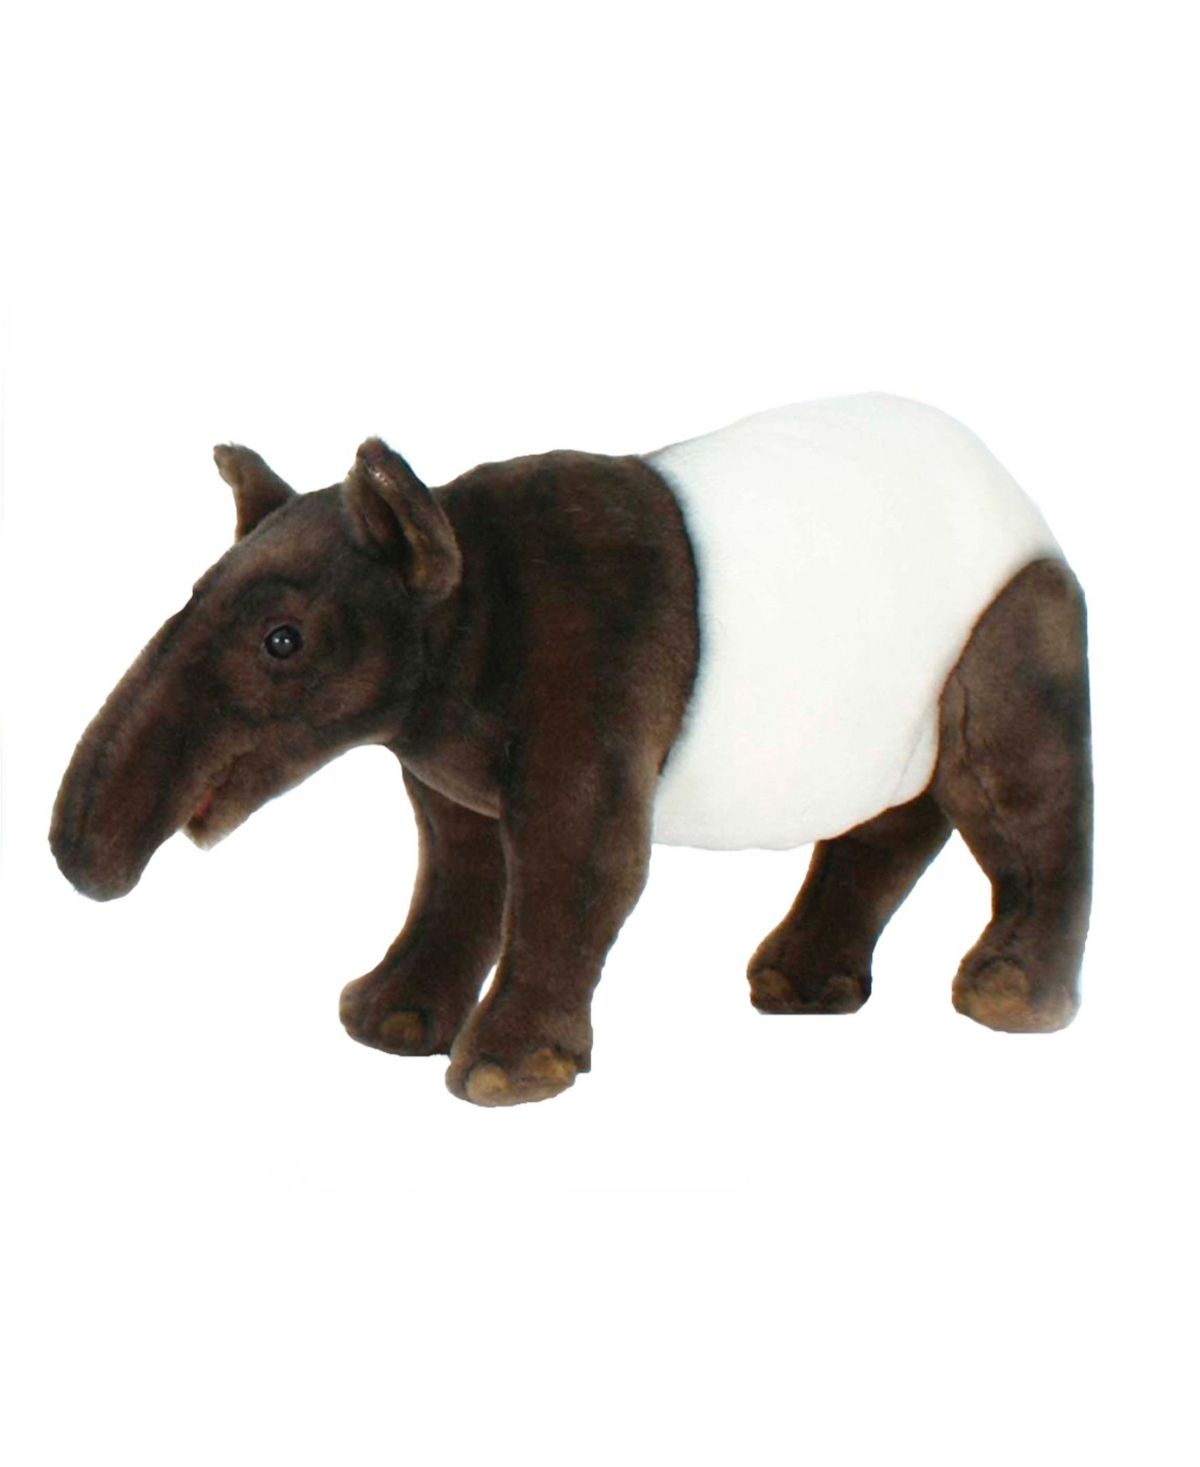 Pin By Yolanda Brenes On Am I Crafty Teddy Bear Stuffed Animal Animal Plush Toys Tapir [ 1467 x 1200 Pixel ]